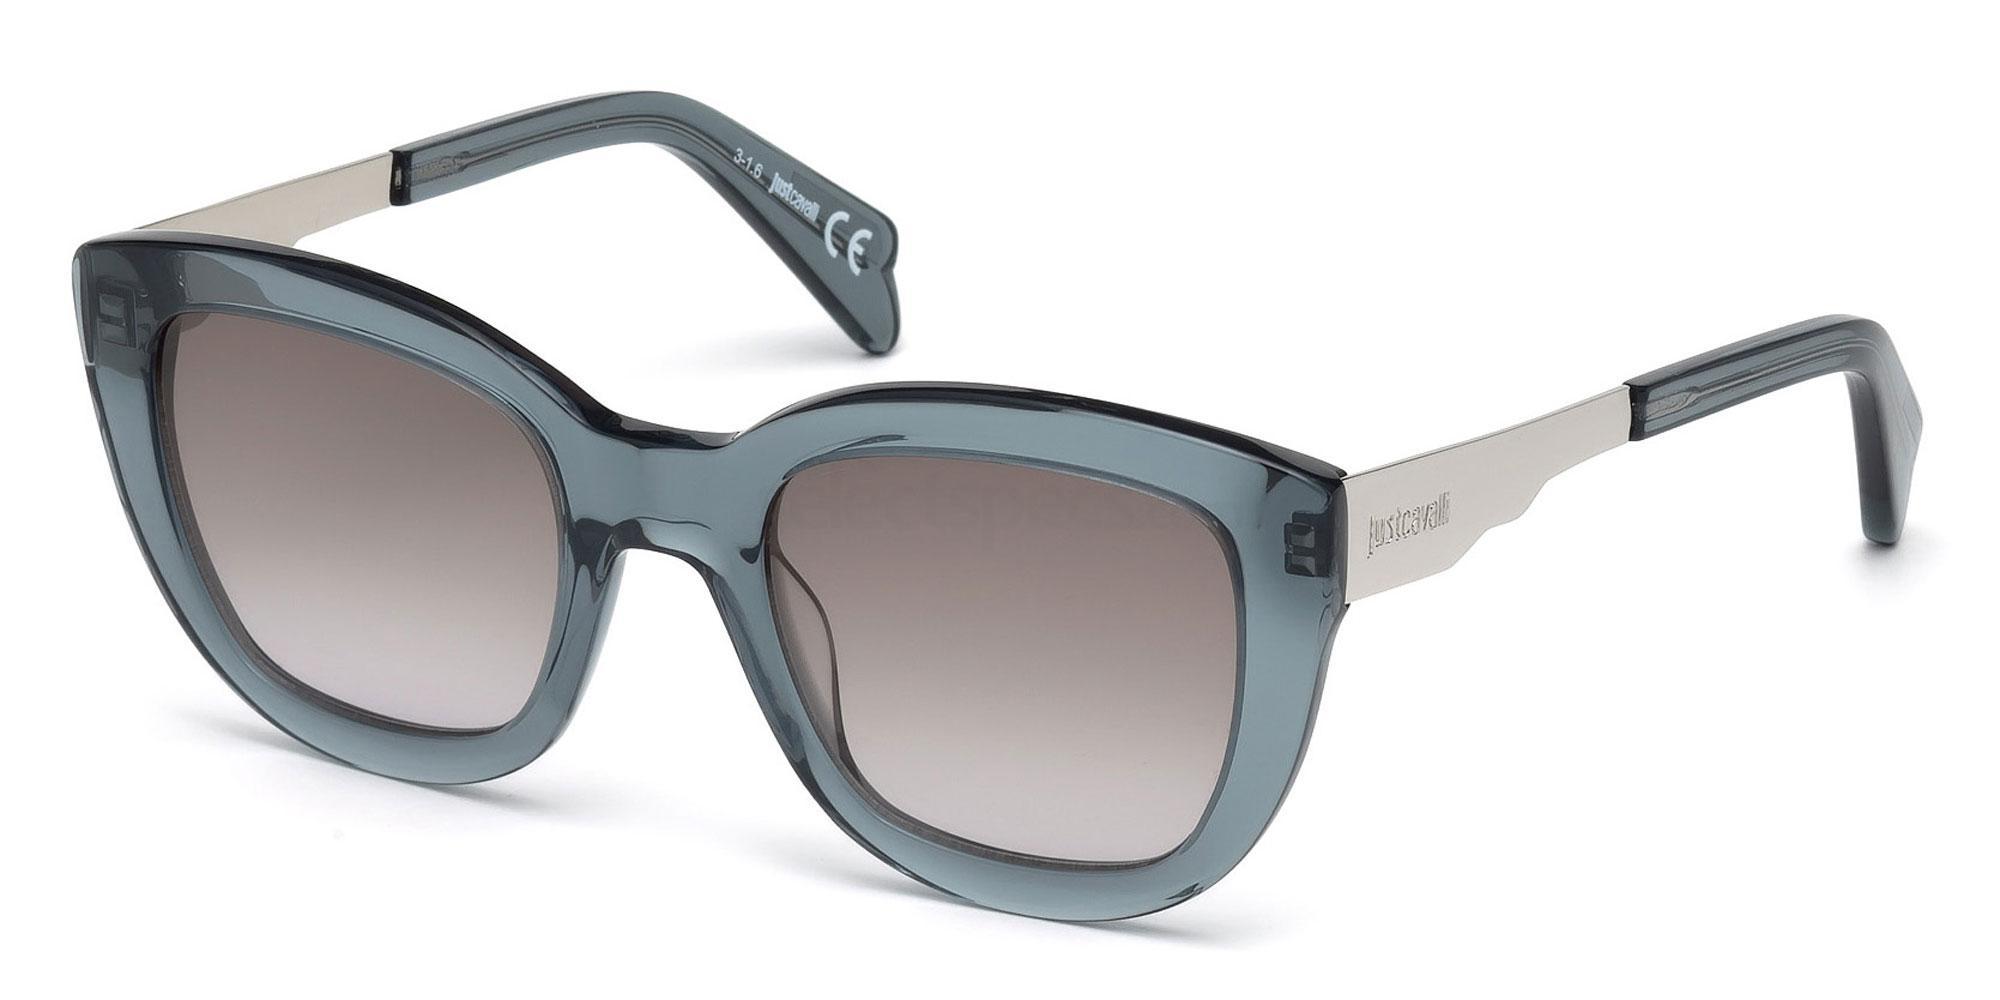 20K JC754S Sunglasses, Just Cavalli